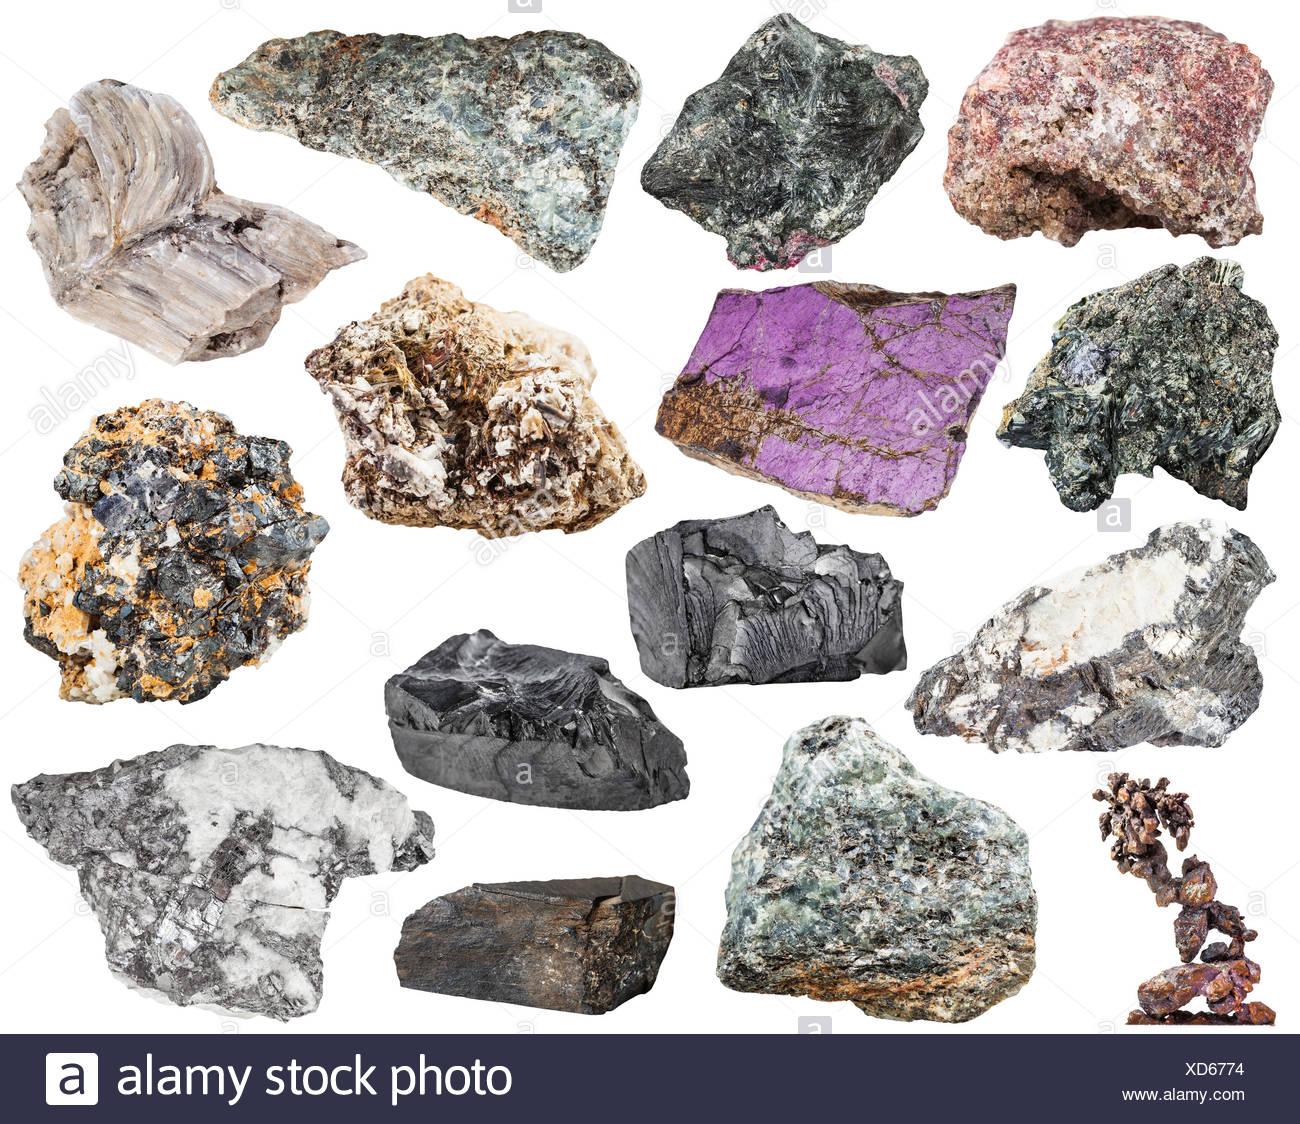 set of various natural mineral stones and rocks - baryte, barite, bismuthinite, bismuth, molybdenite, glaucophane, jet, lignite, shungite, shungit, nepheline, galena, etc isolated on white background - Stock Image